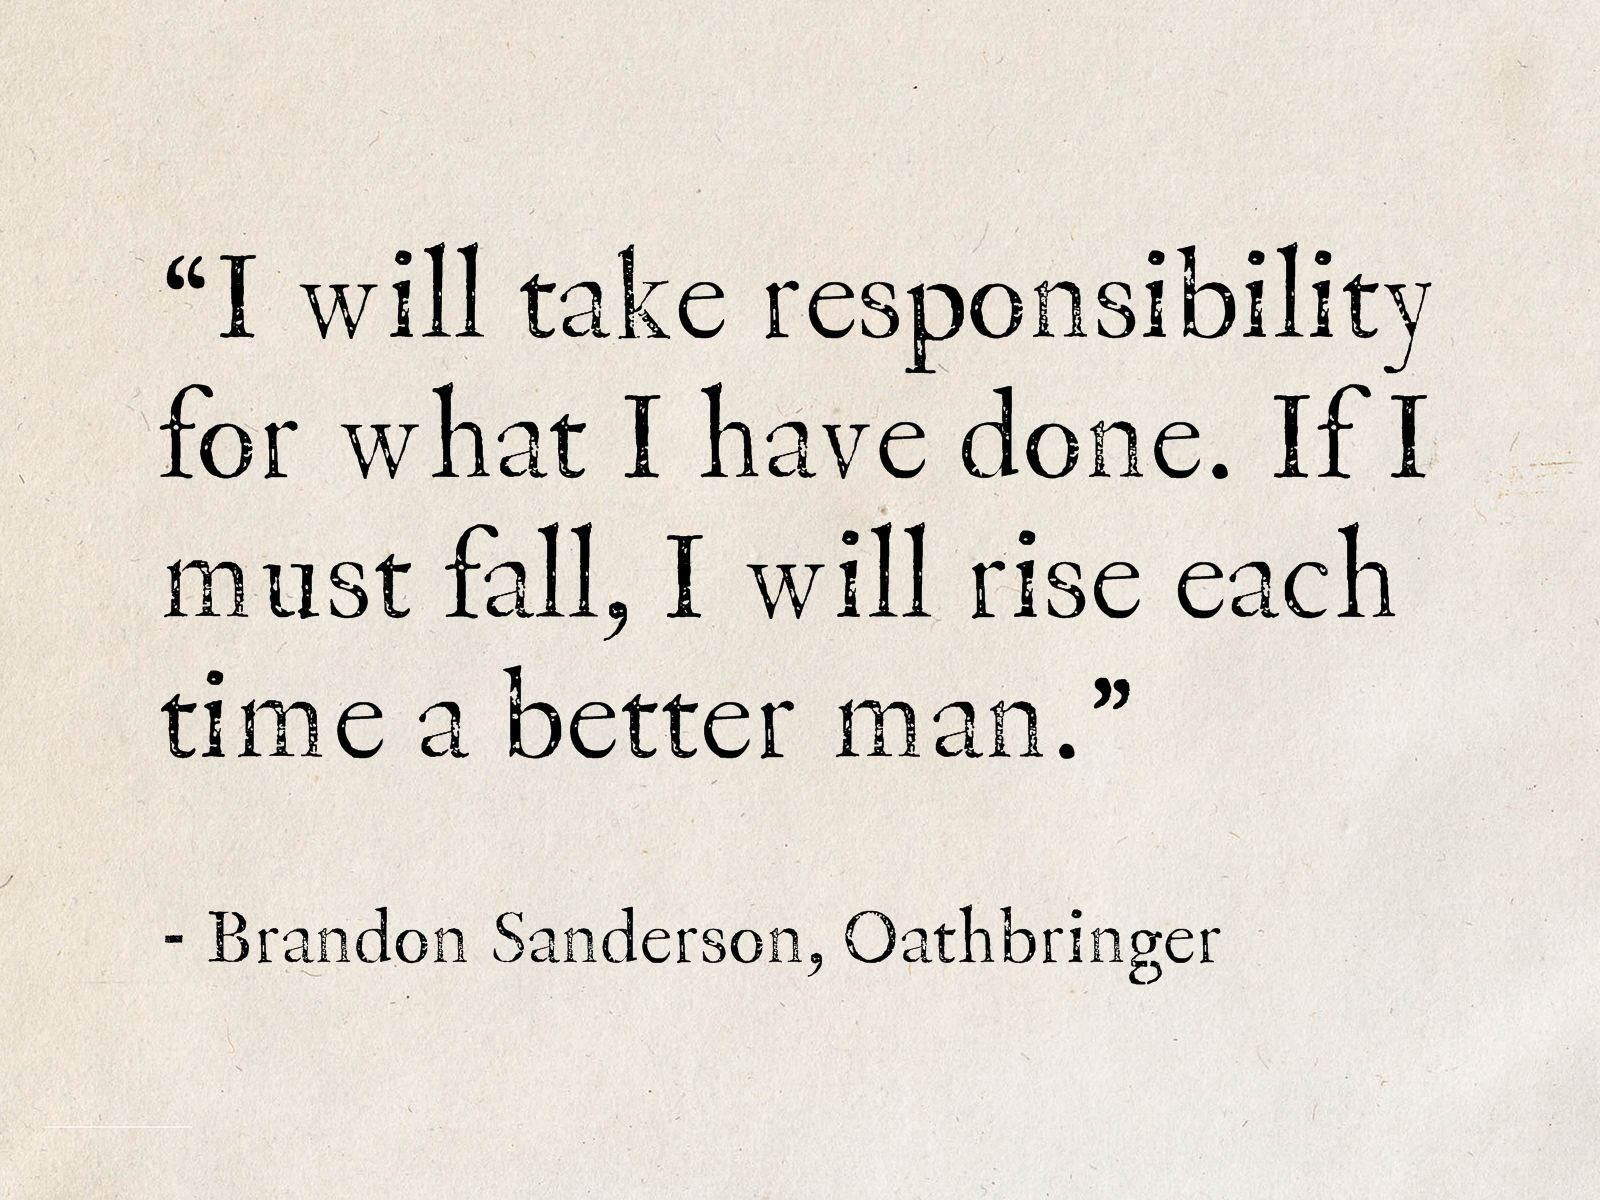 Brandon Sanderson Oathbringer The Stormlight Archive Tolkein Quotes Stormlight Archive Archives Quotes